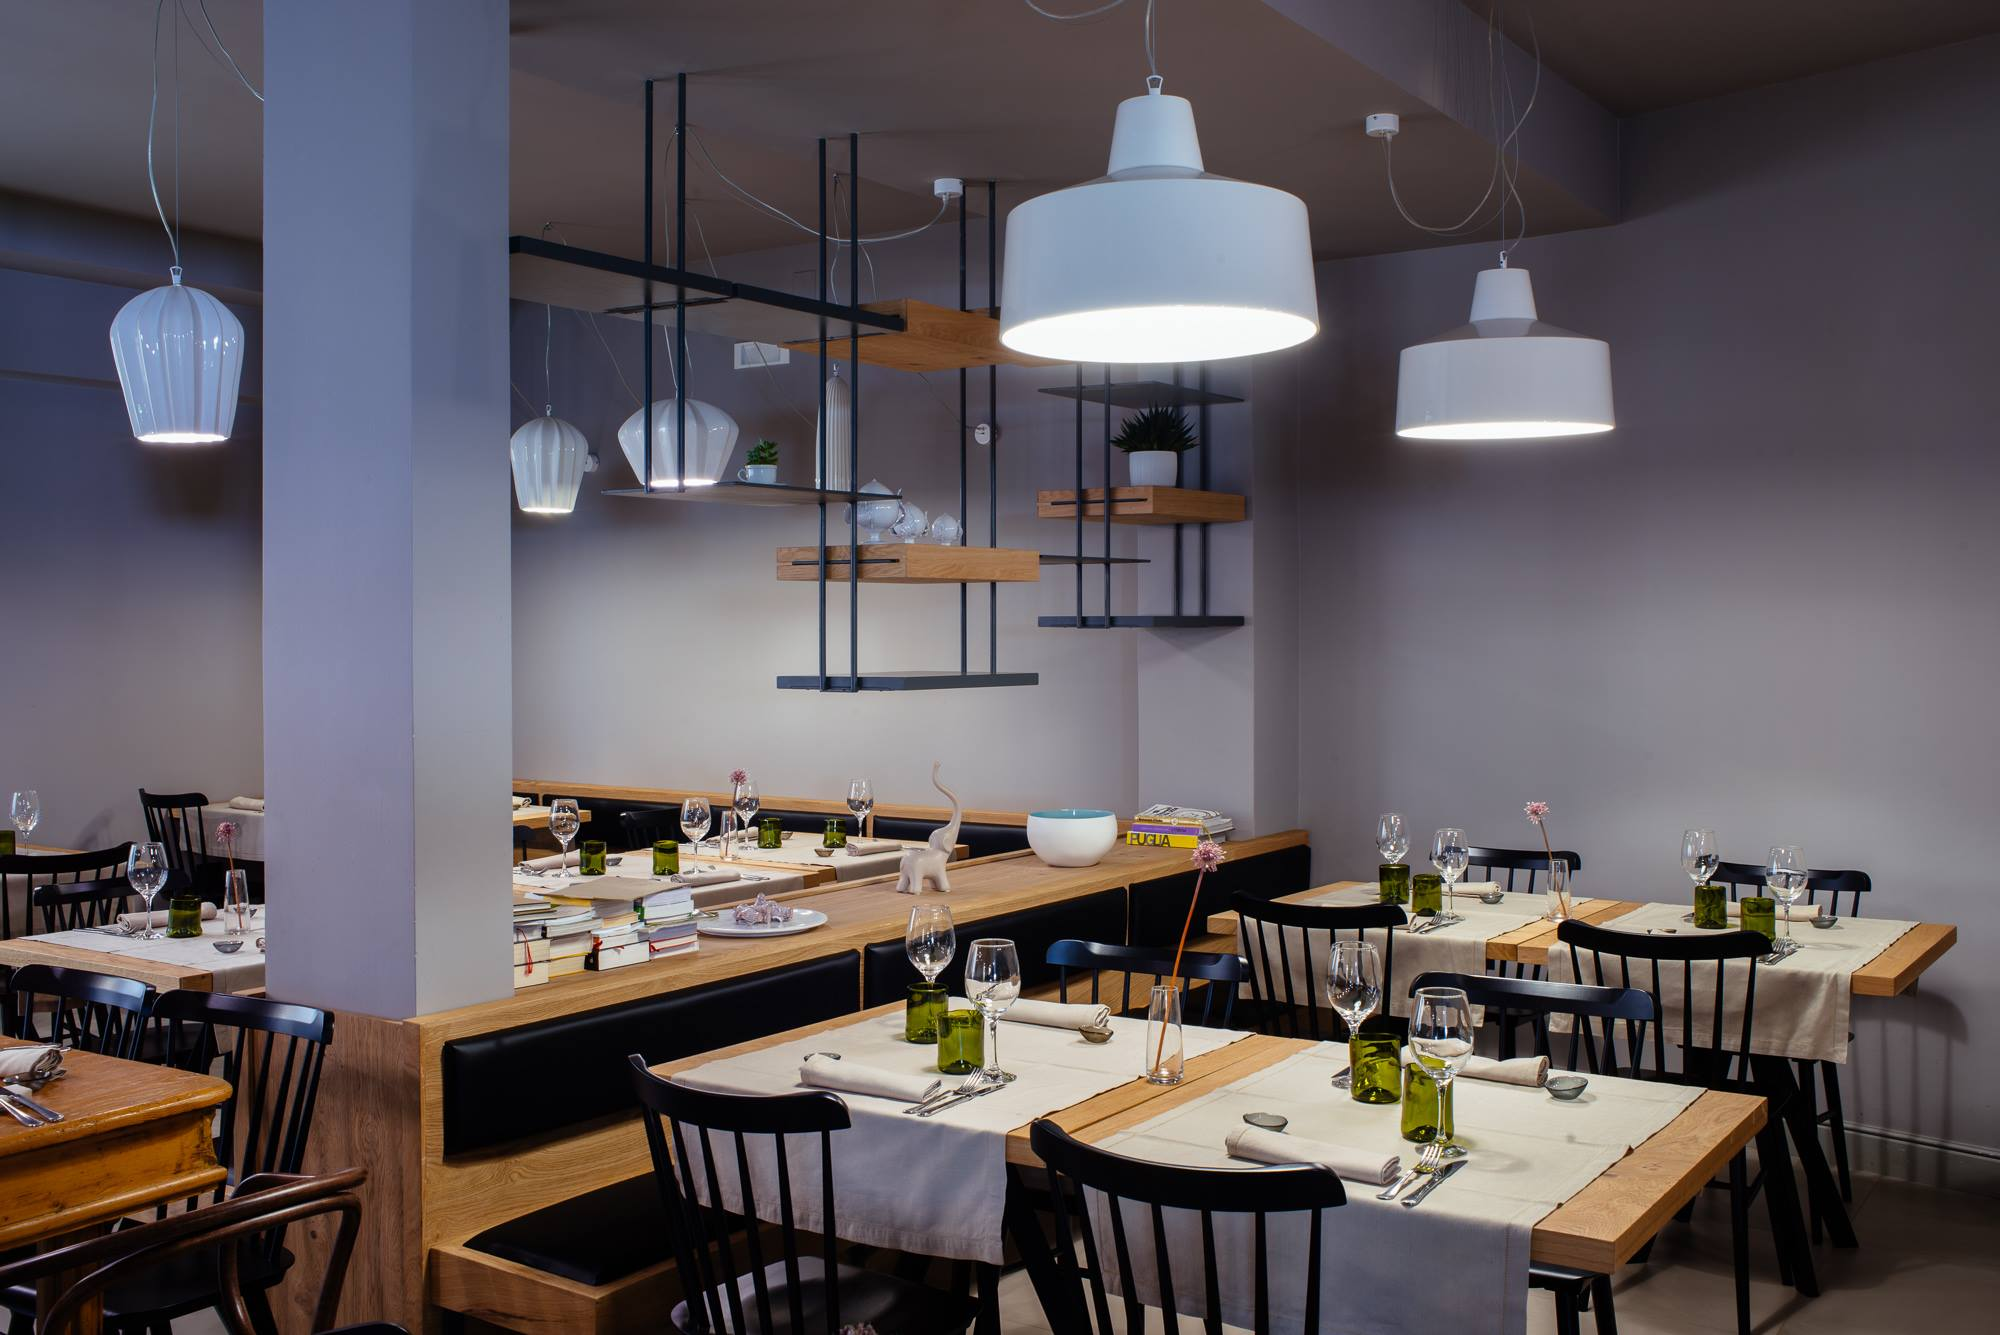 GANGSTER E SAHARA illuminazione per ristoranti